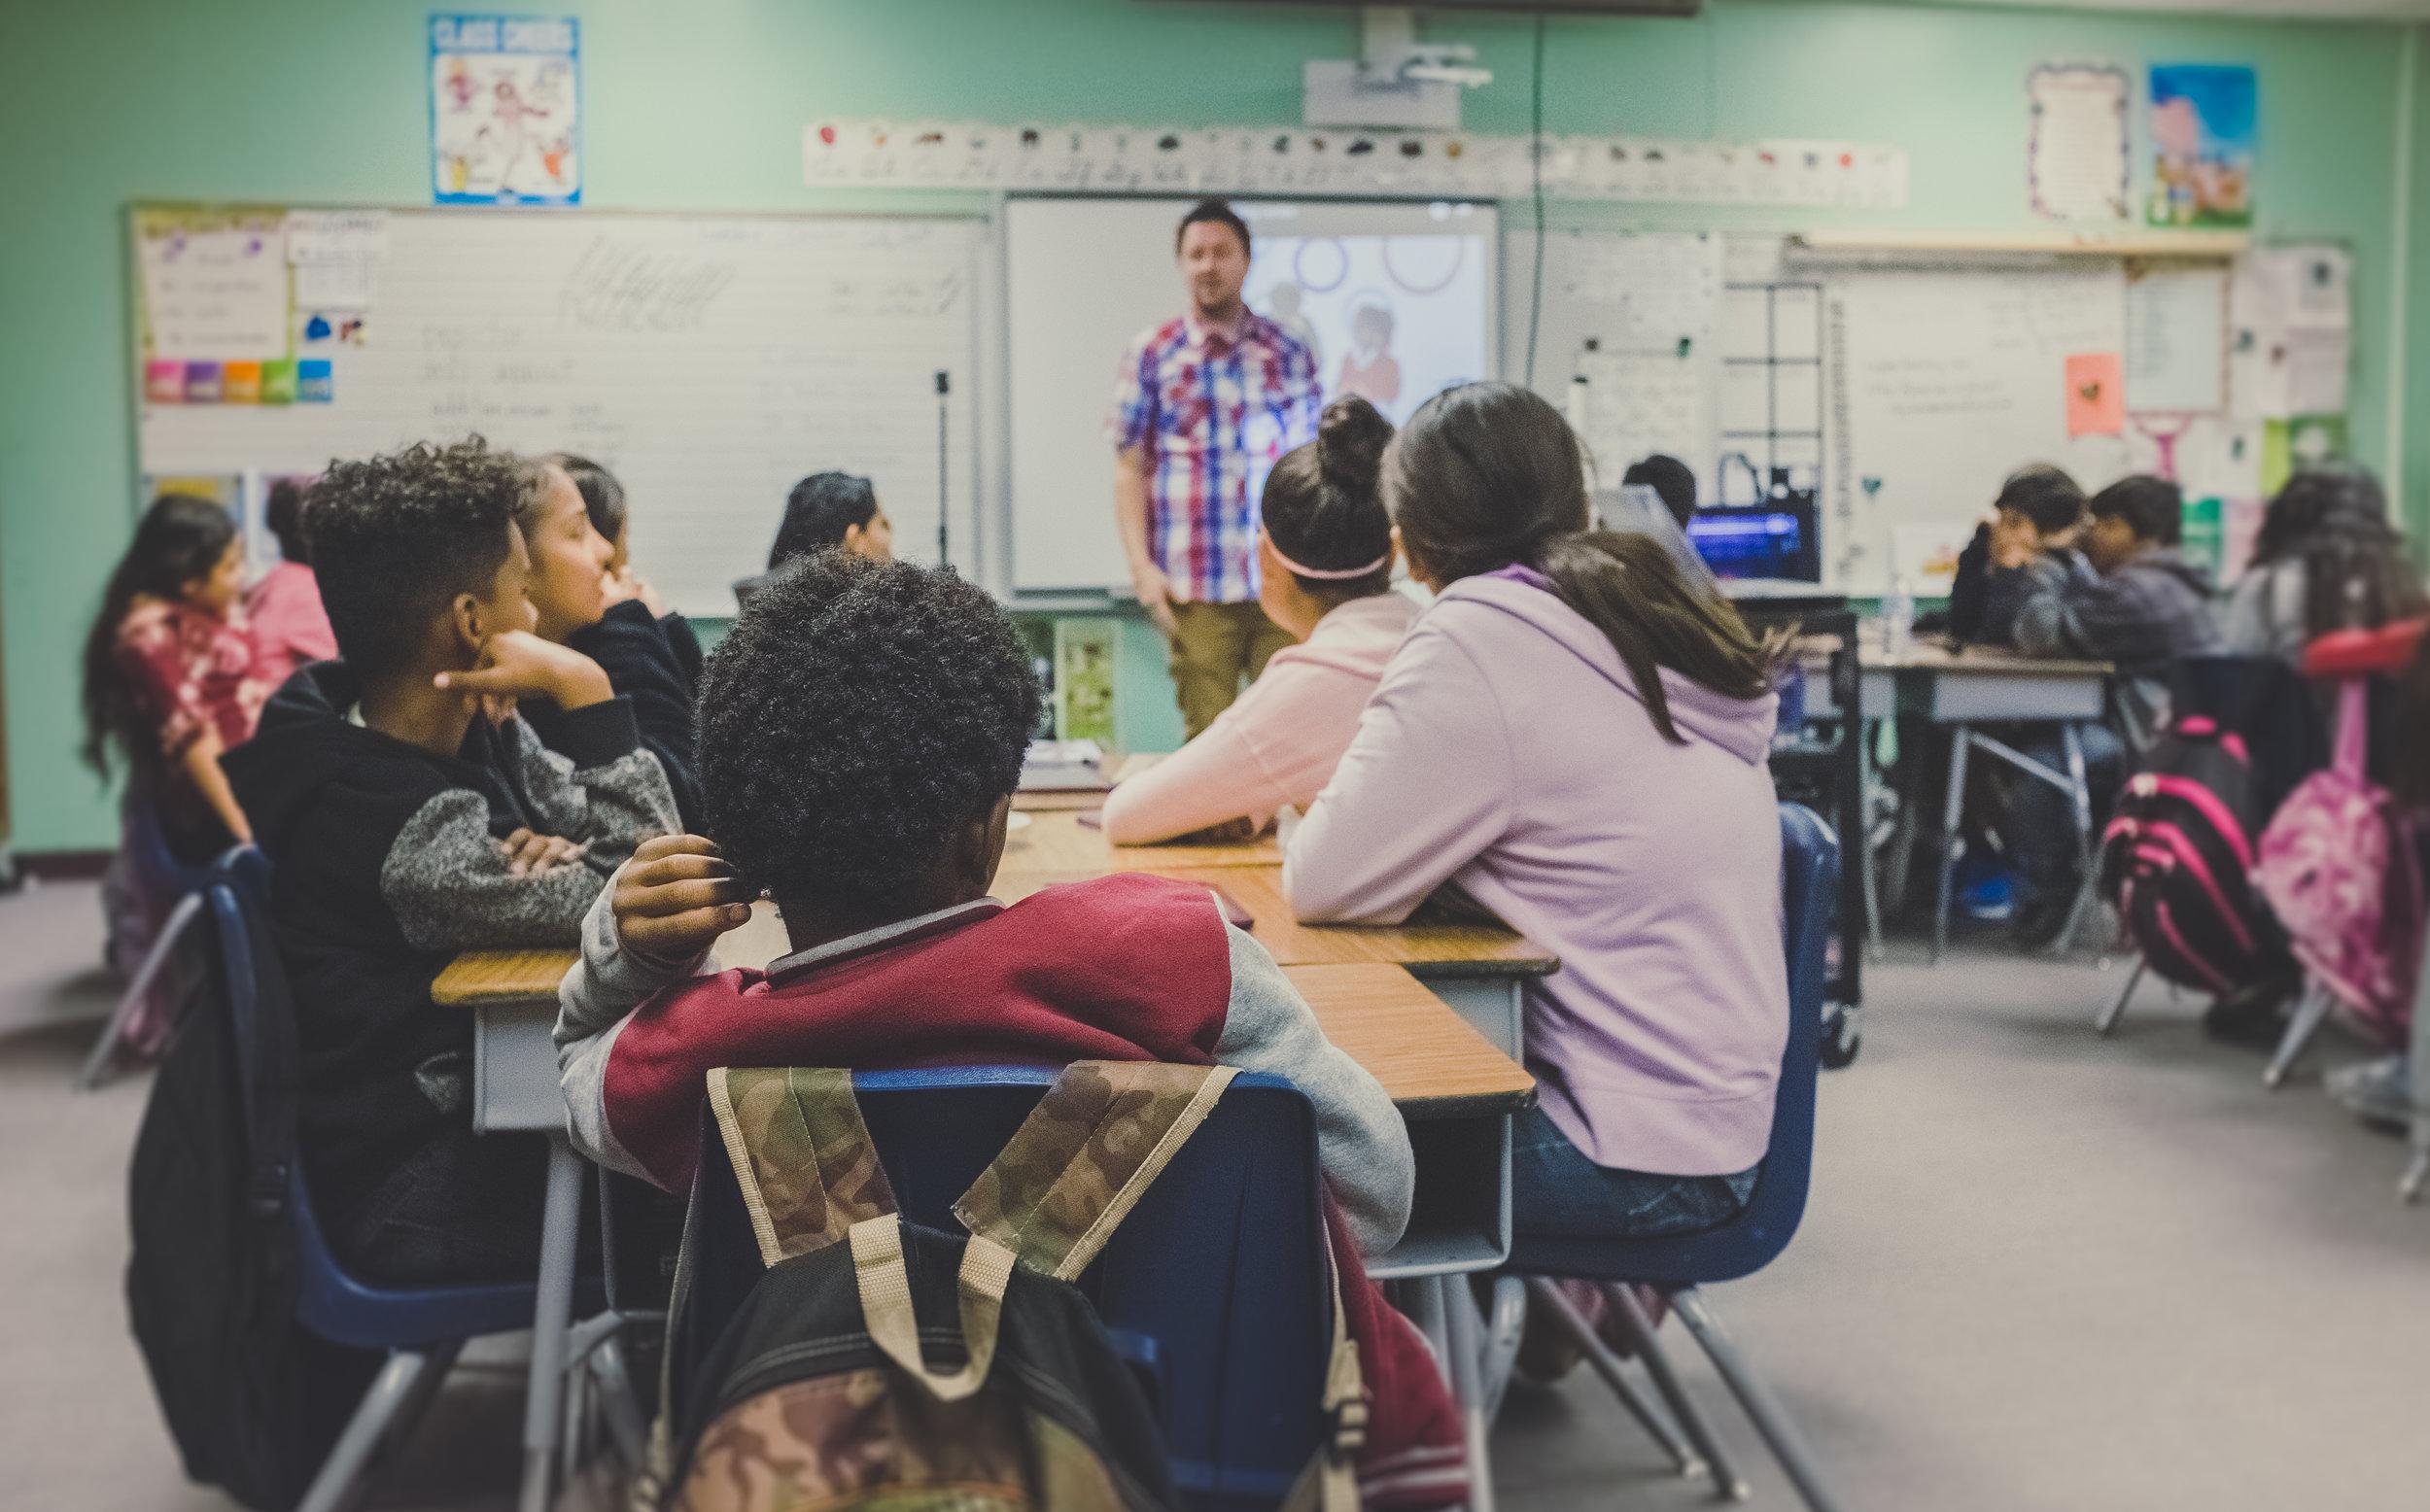 Public & Private Education Systems